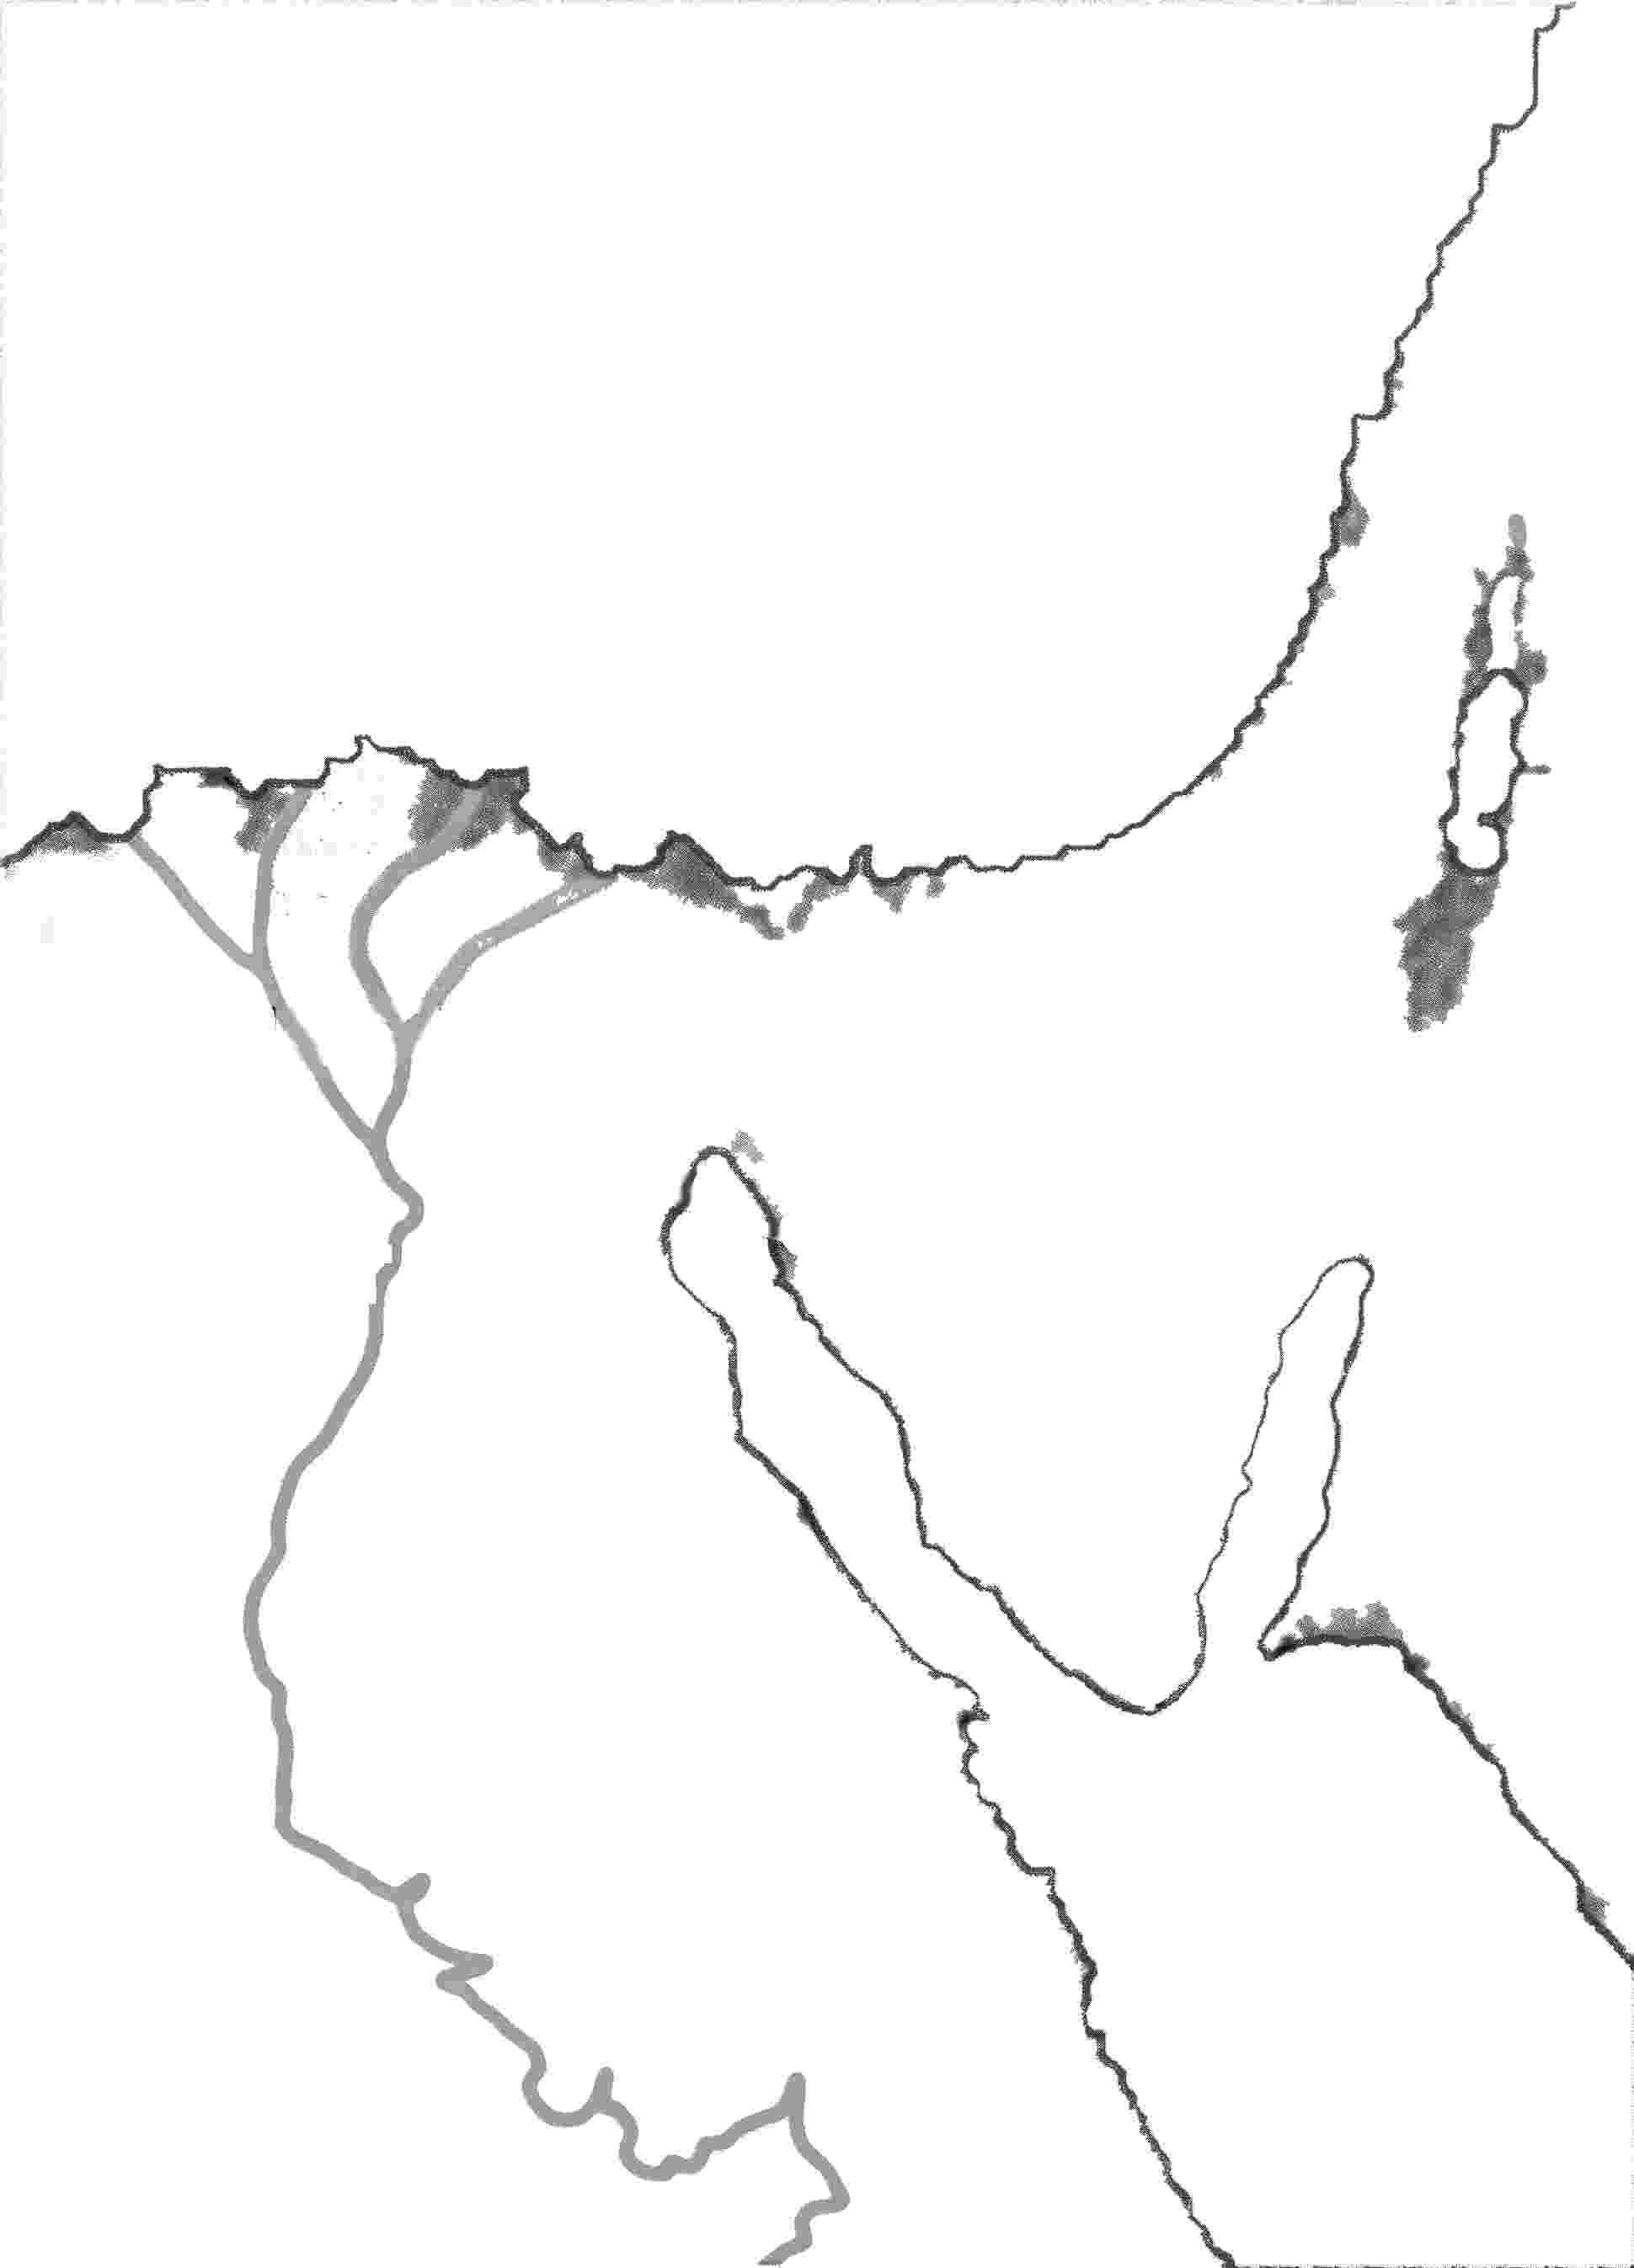 egypt coloring map nefertiti stock vectors images vector art shutterstock egypt coloring map